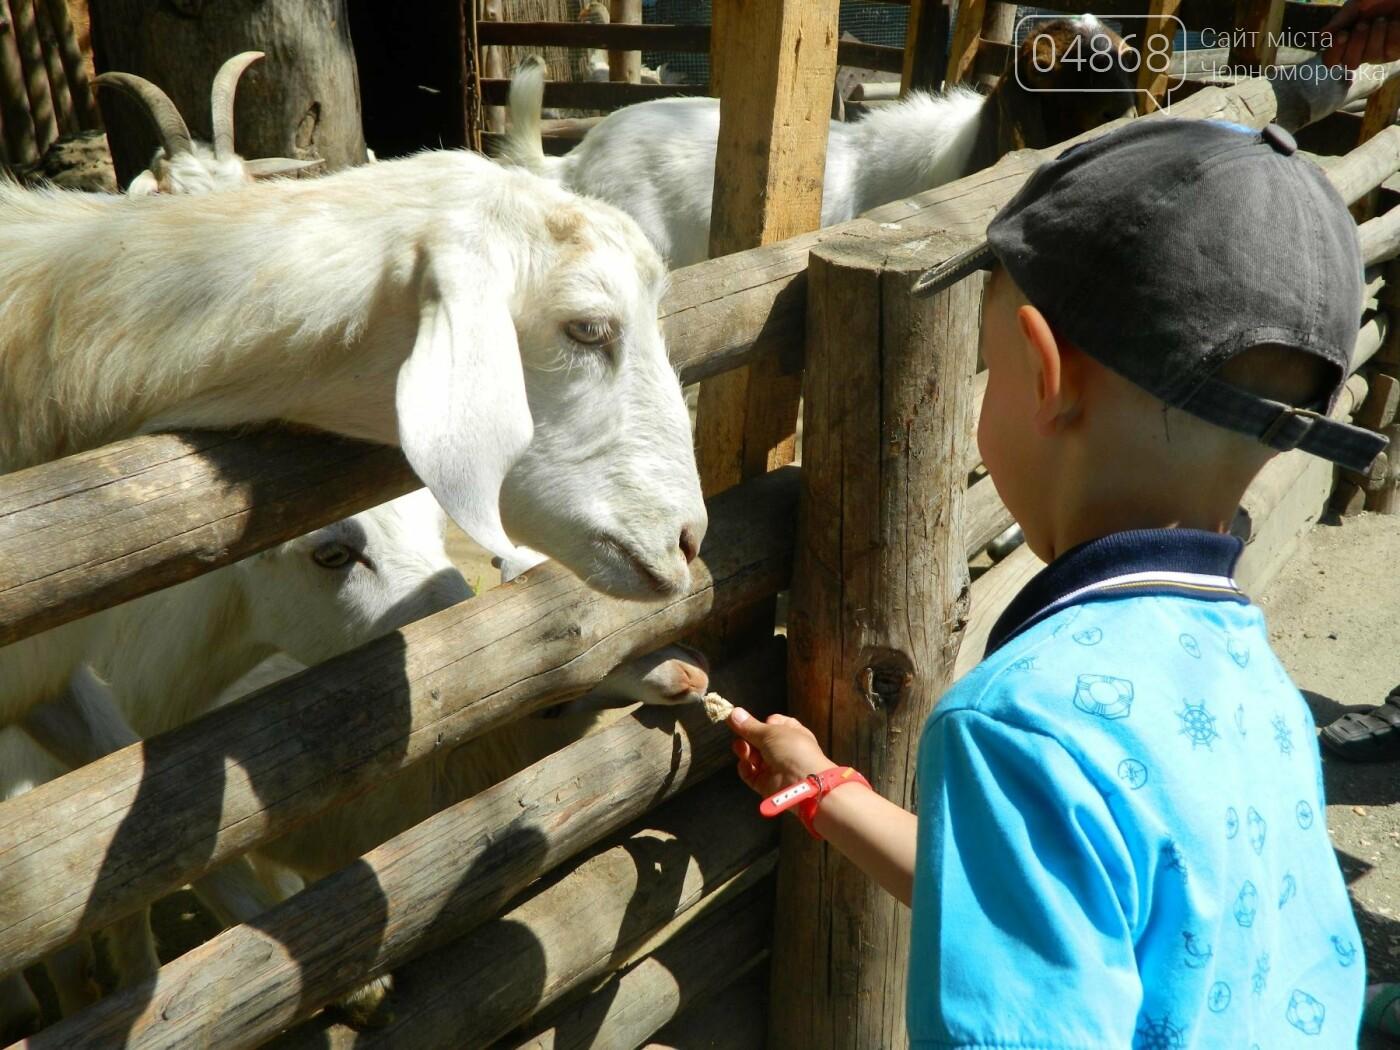 Дети из реабилитационного центра «Радуга» посетили зоопарк, фото-11